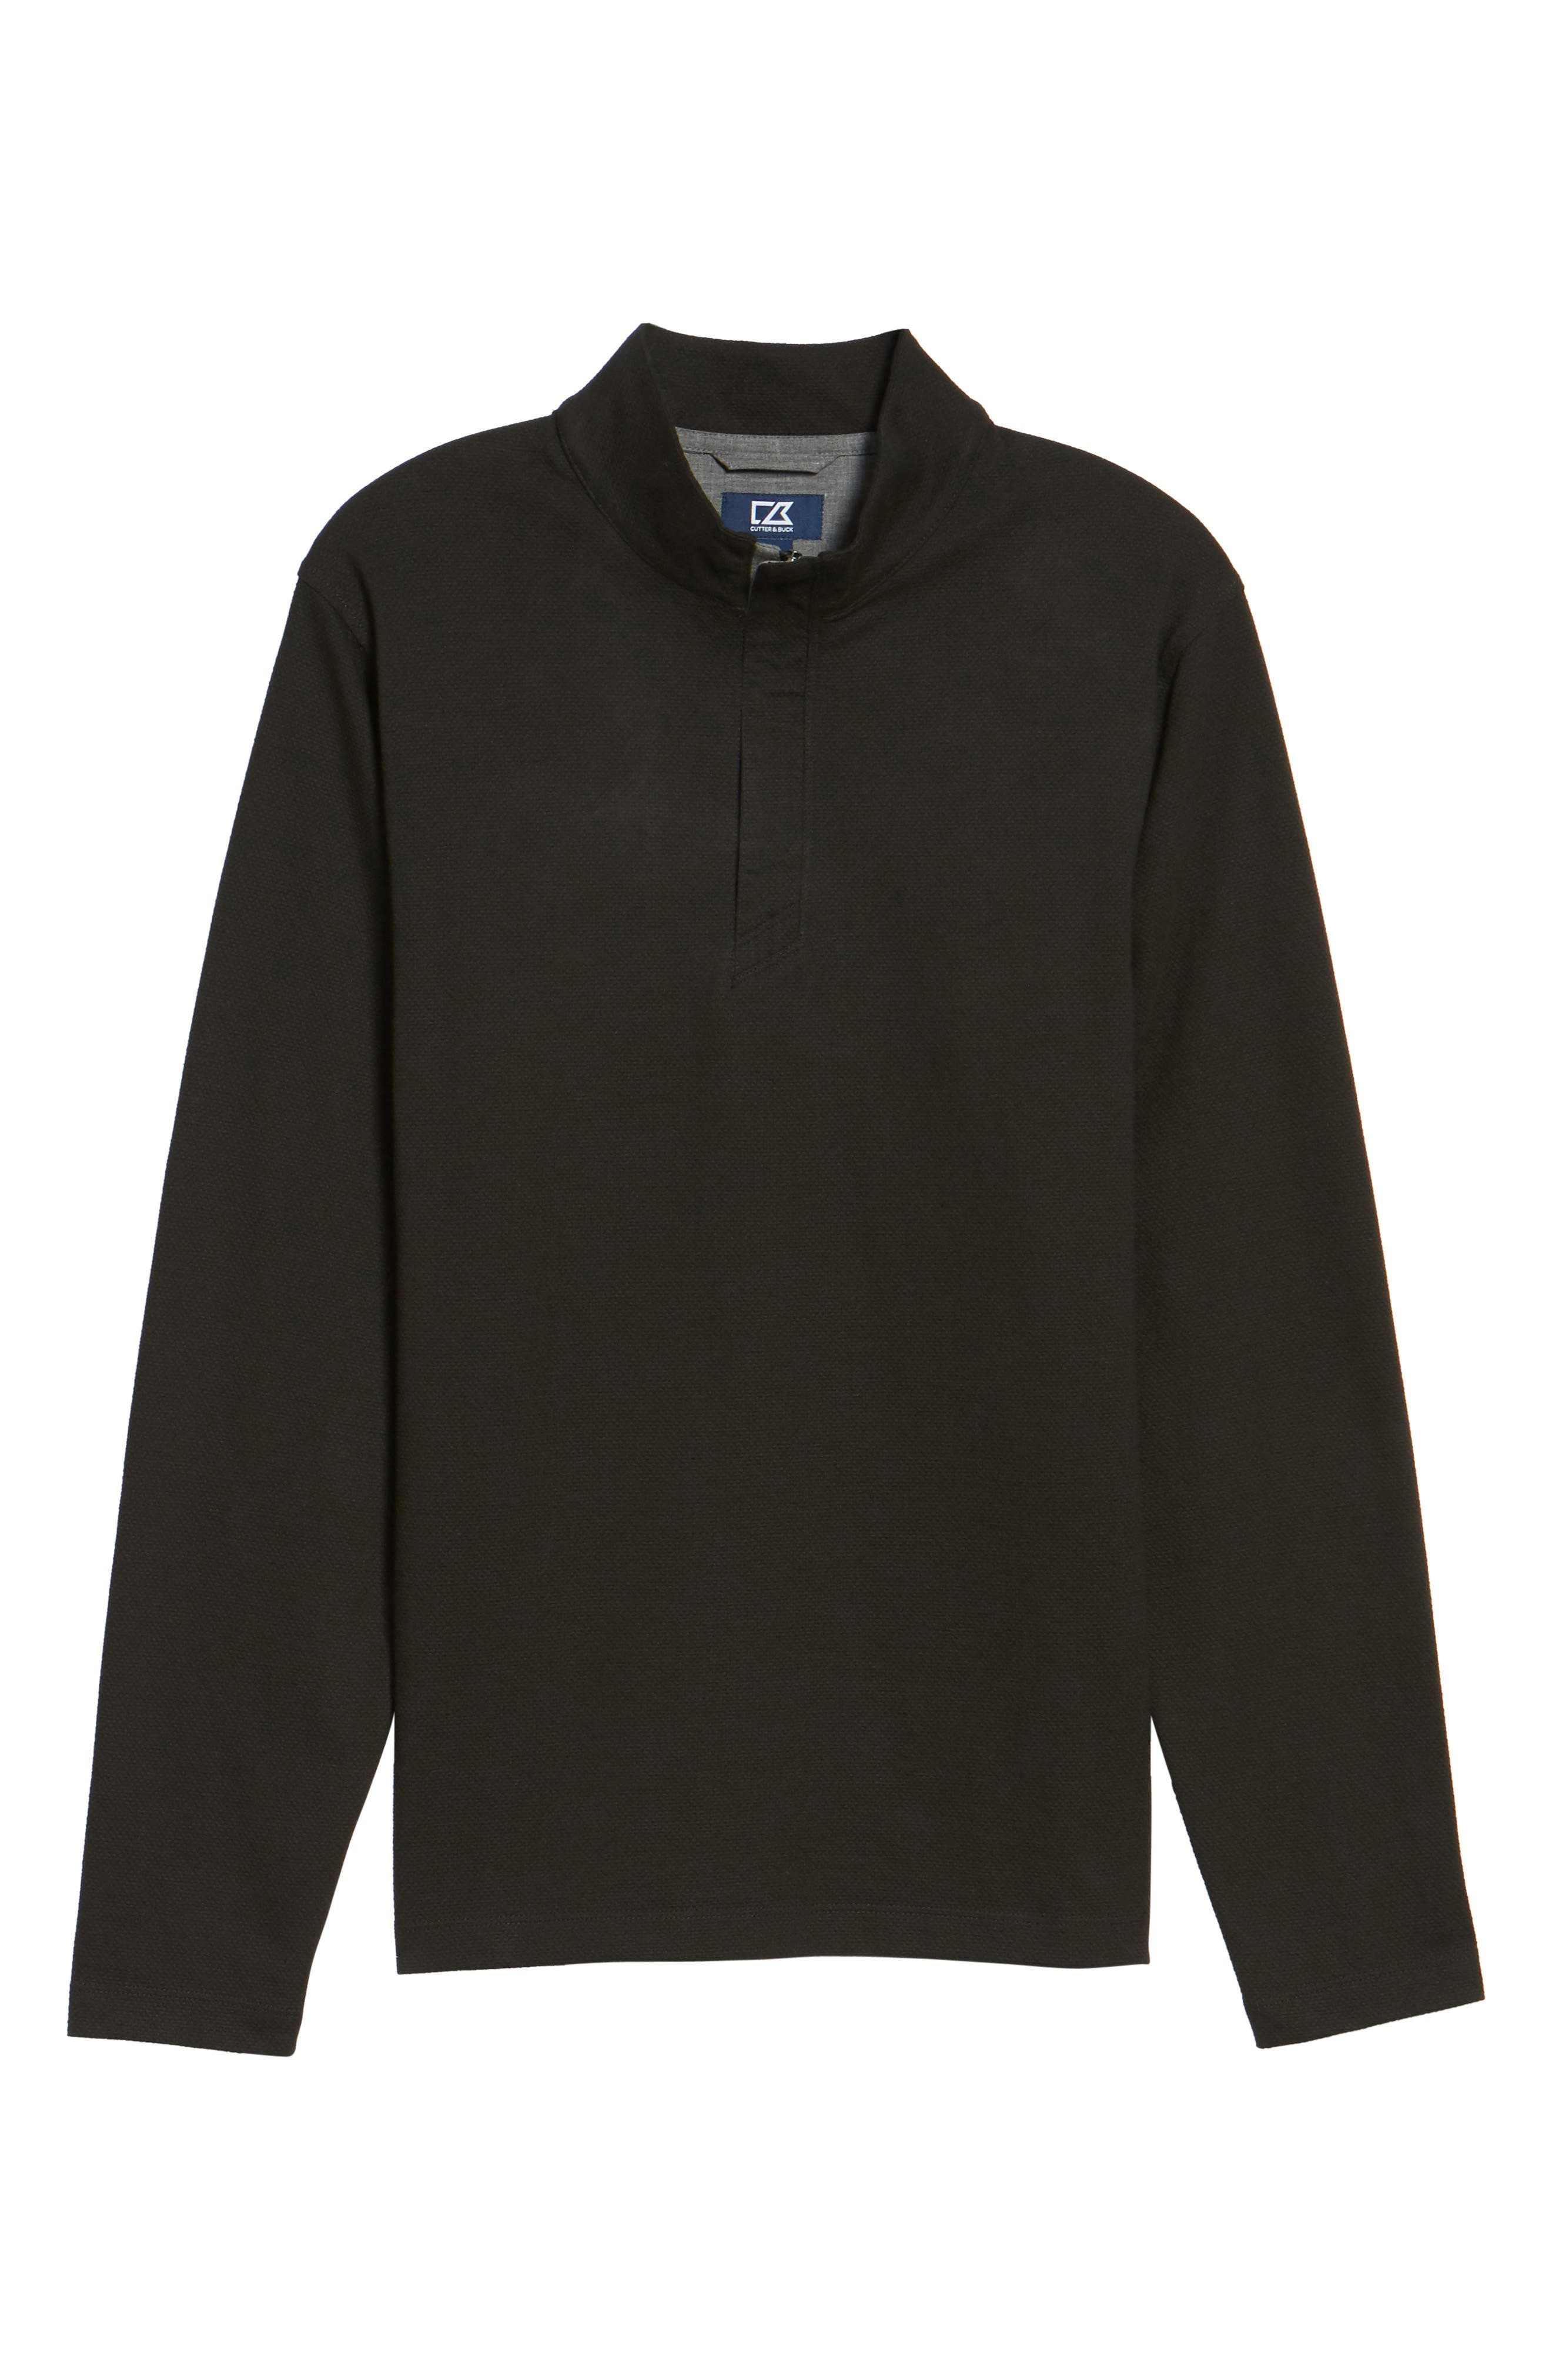 Hewitt Quarter-Zip Waffle Knit Pullover,                             Alternate thumbnail 6, color,                             Black